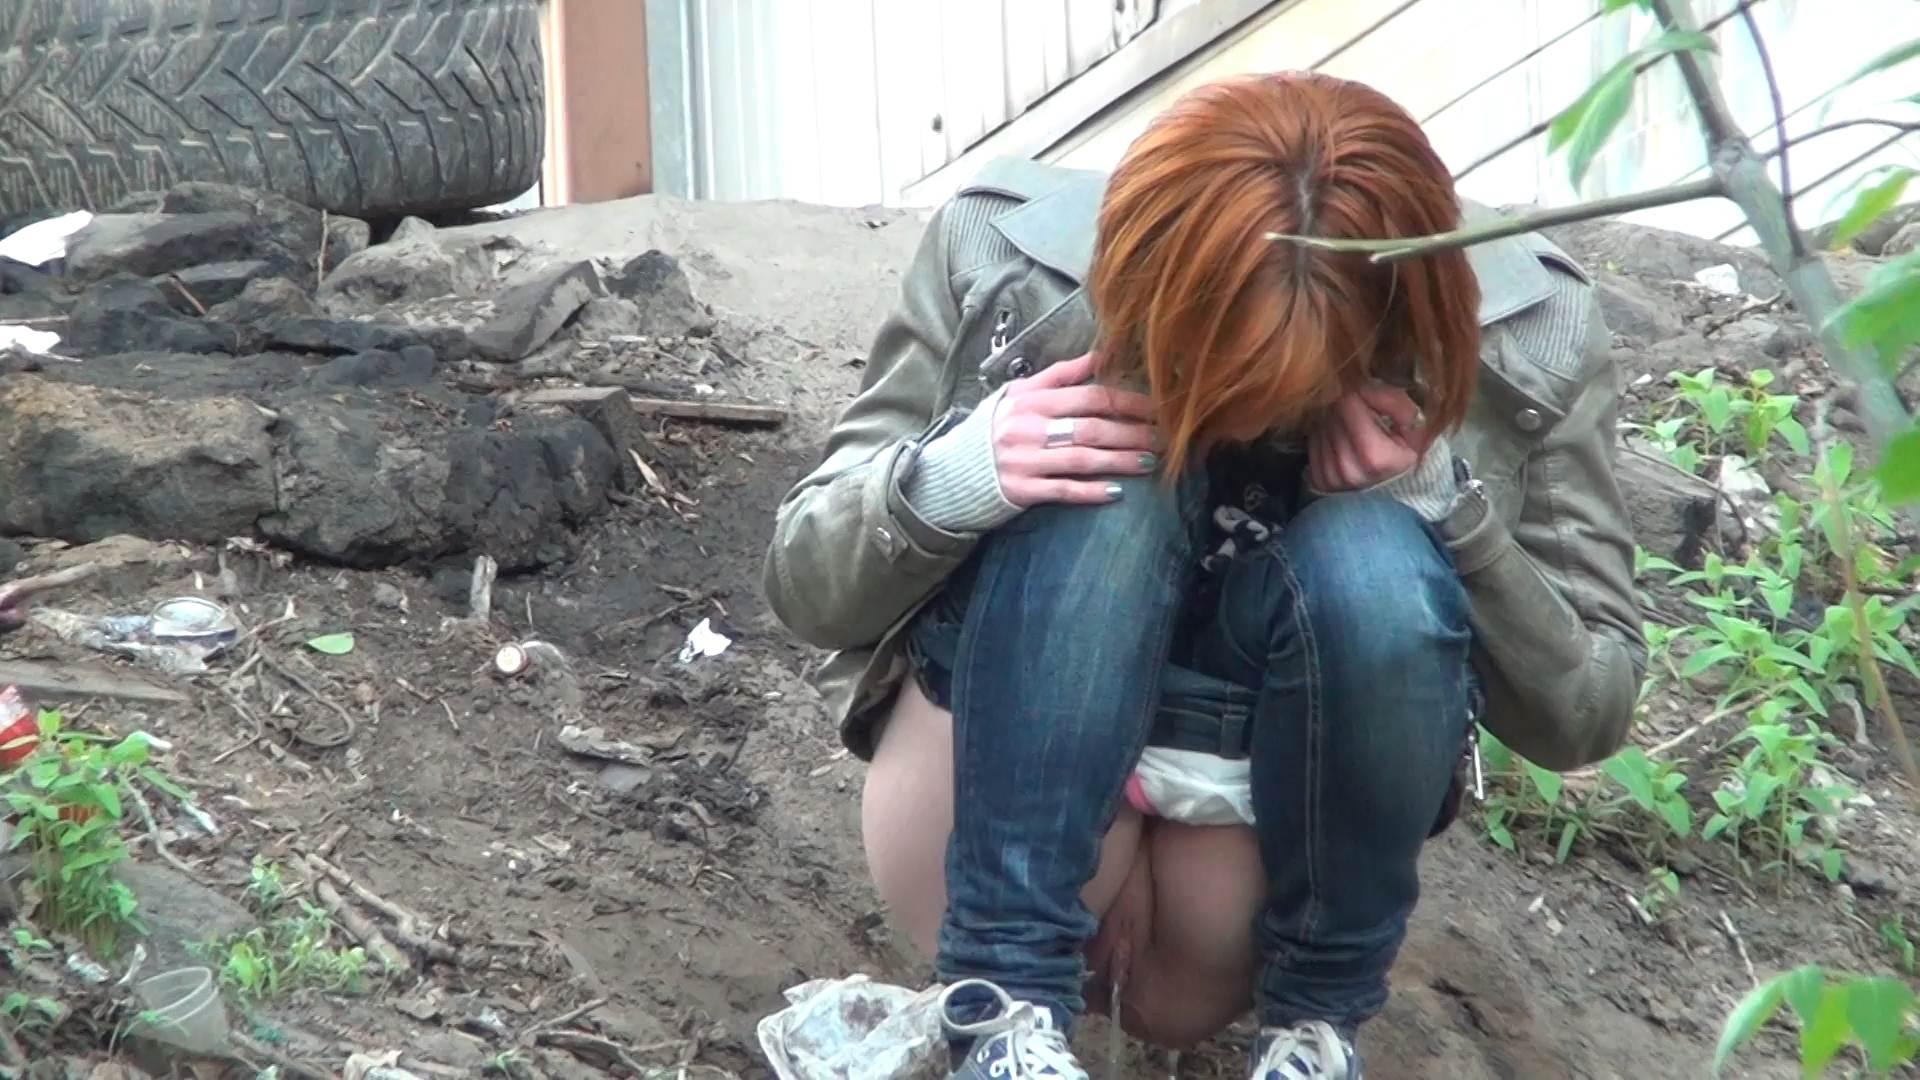 девушка мочится возле гаража онлайн - 8